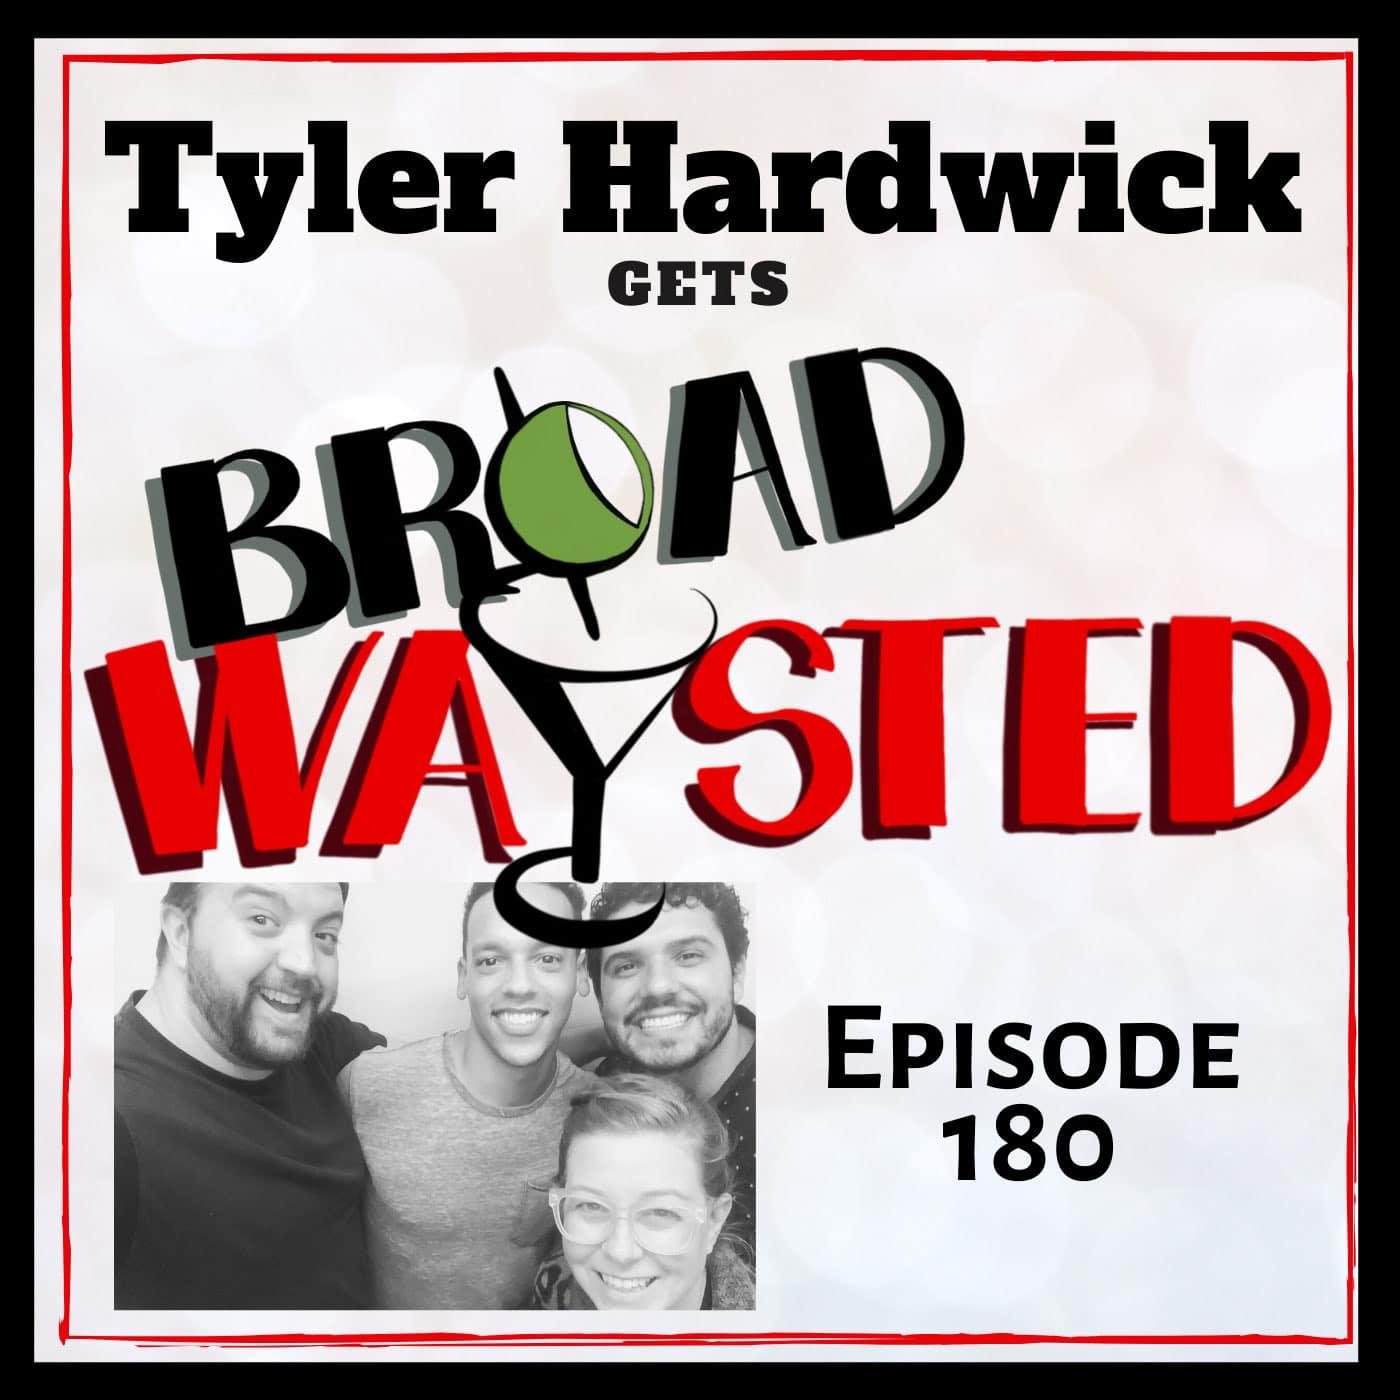 Broadwaysted Episode 180 Tyler Hardwick